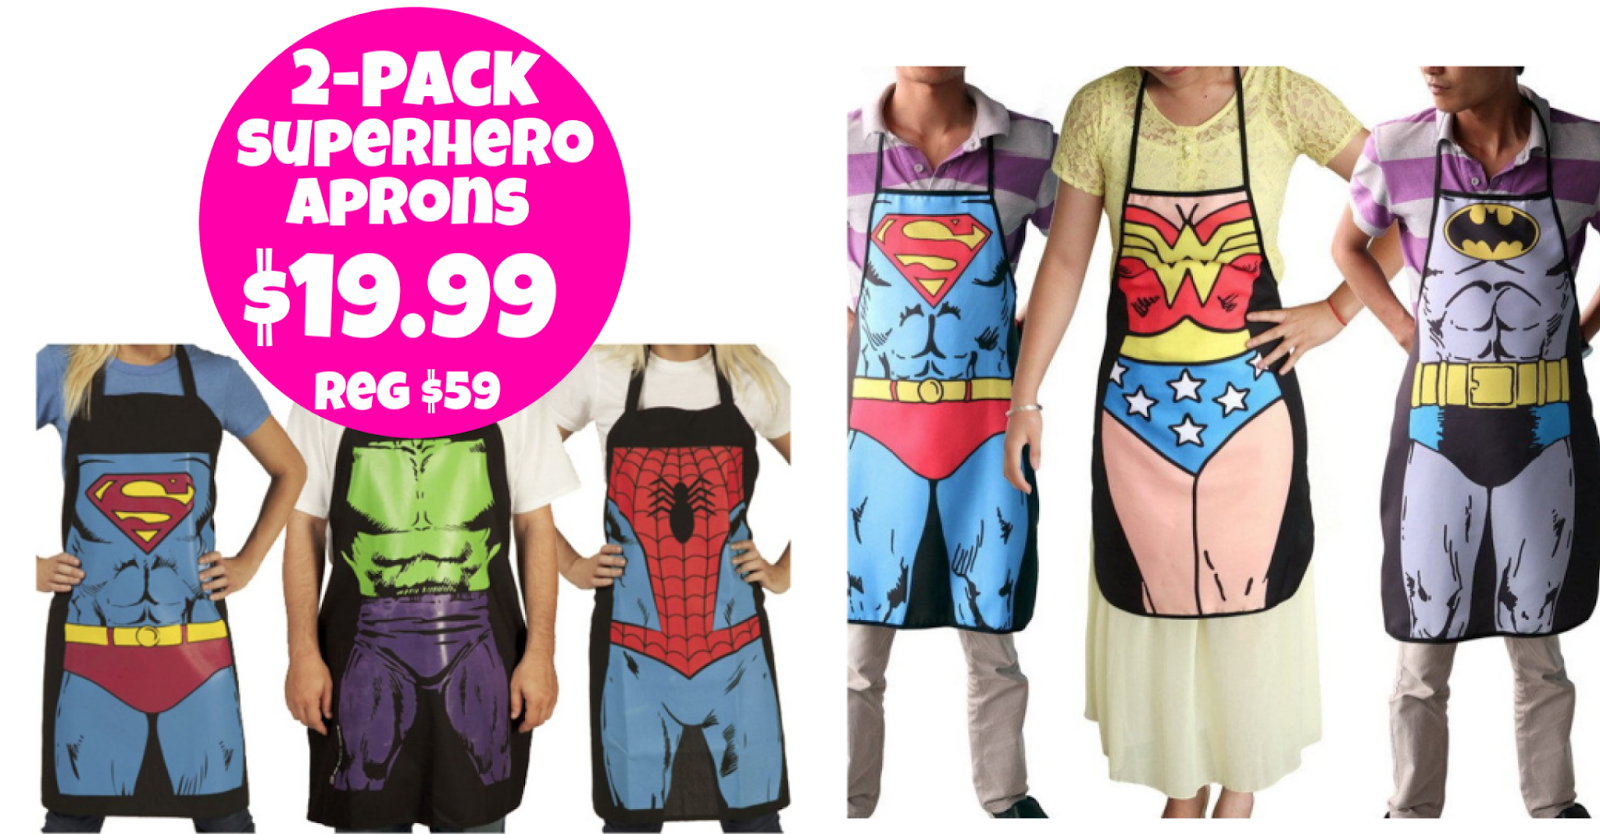 http://www.thebinderladies.com/2015/02/tanga-2-pack-superhero-cooking-aprons.html#.VNLtCIfduyM